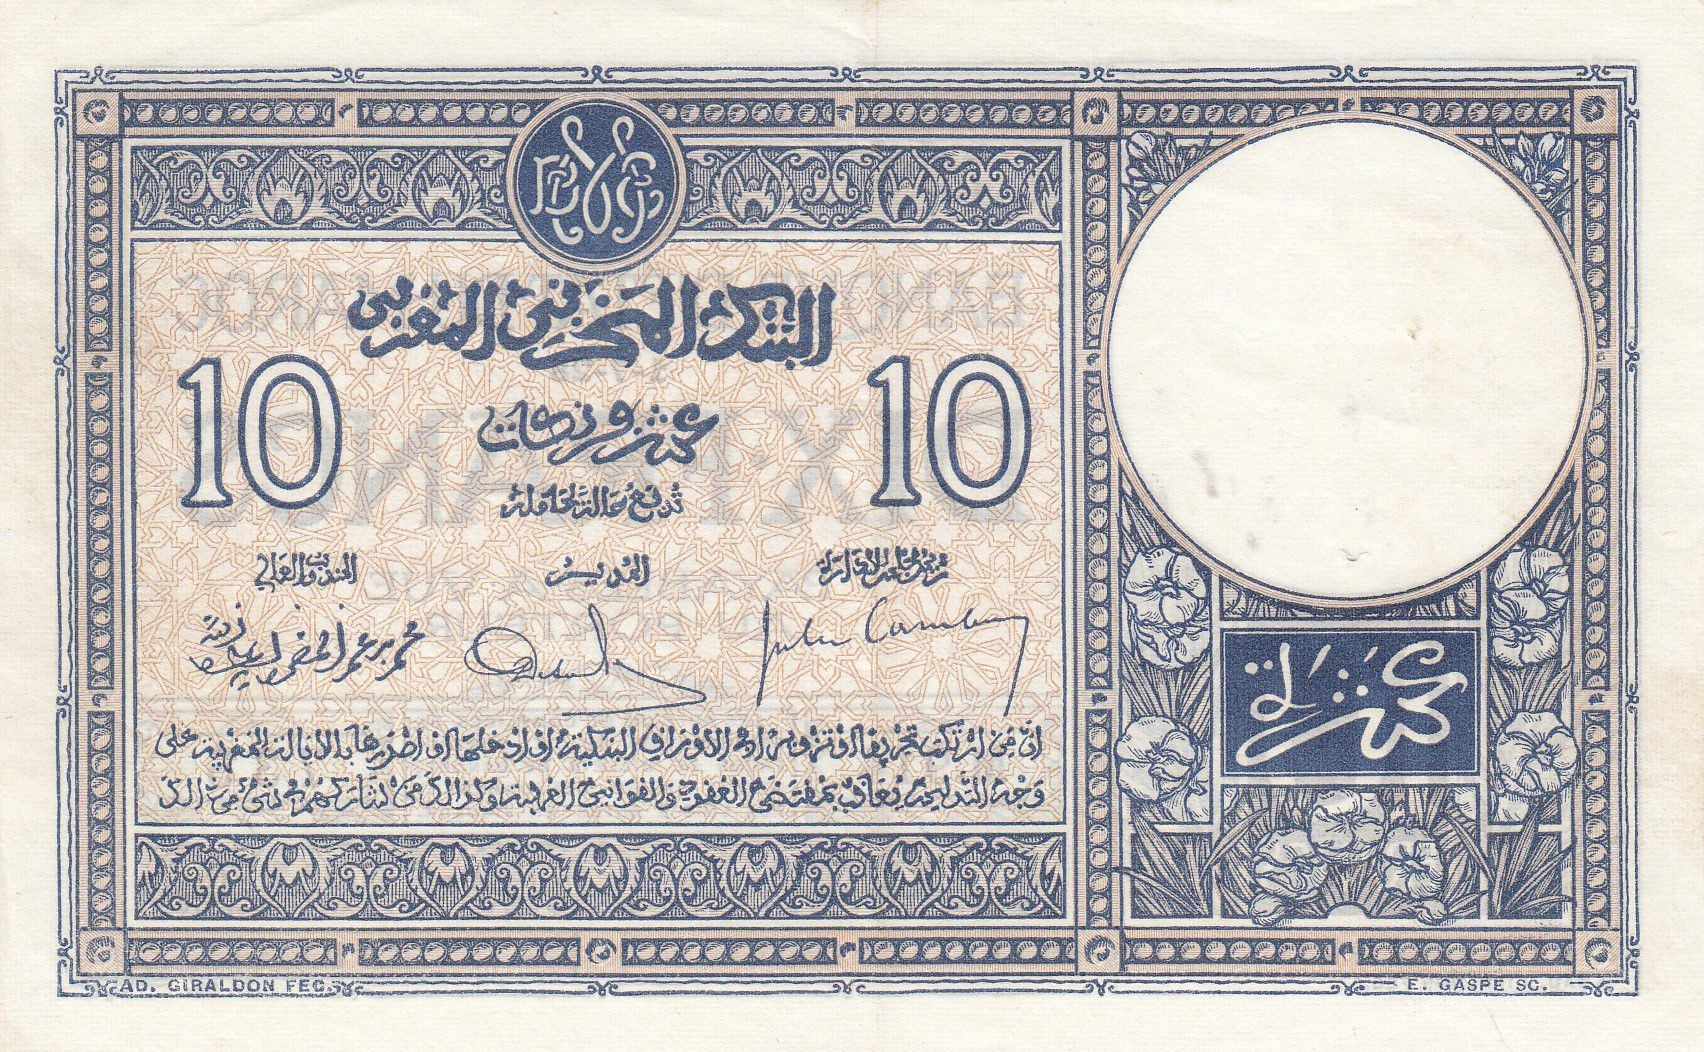 Maroc 10 Francs 01-07-1928 - TTB - Série M.914-735 - P.11b